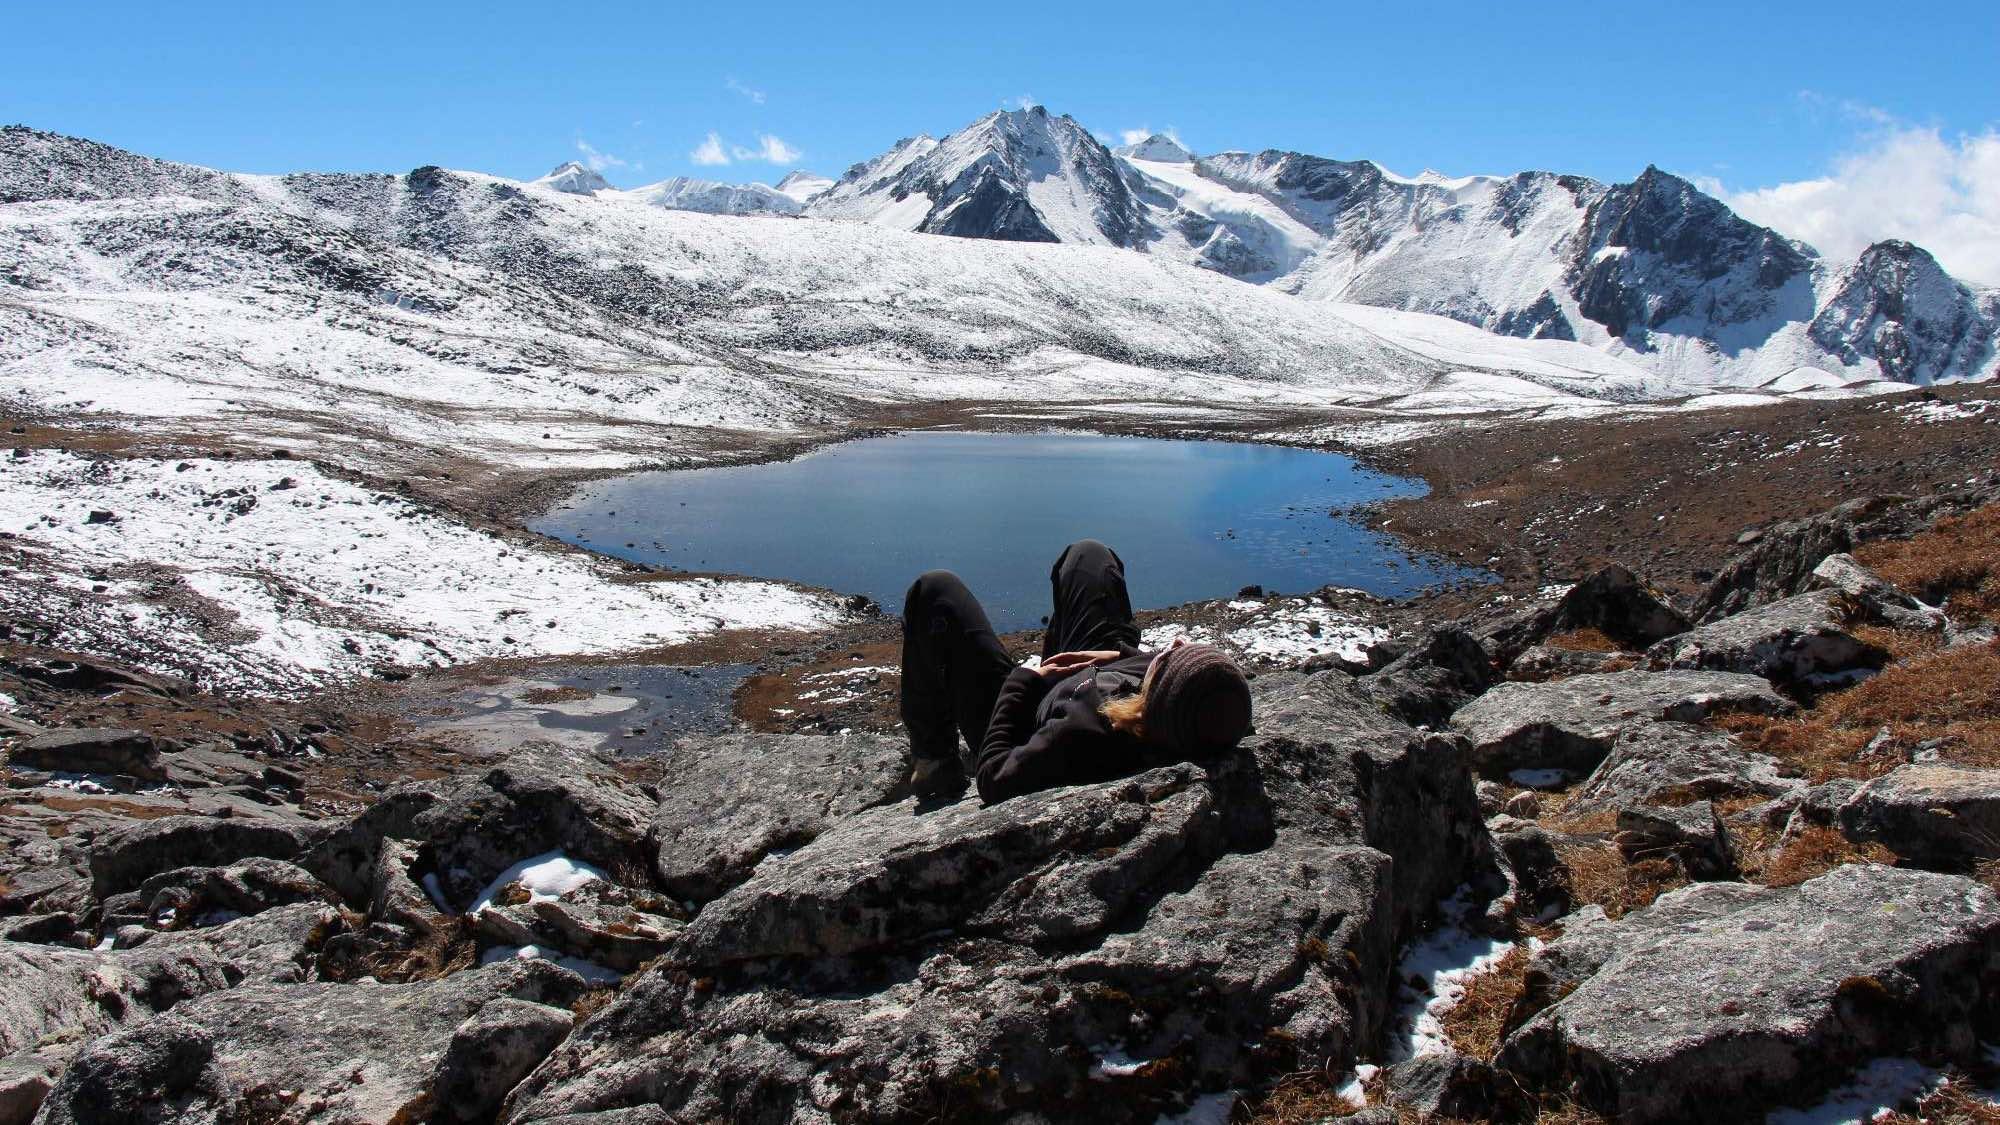 Resting during the Snowman trek in Bhutan - Photo: Veronika Švecová